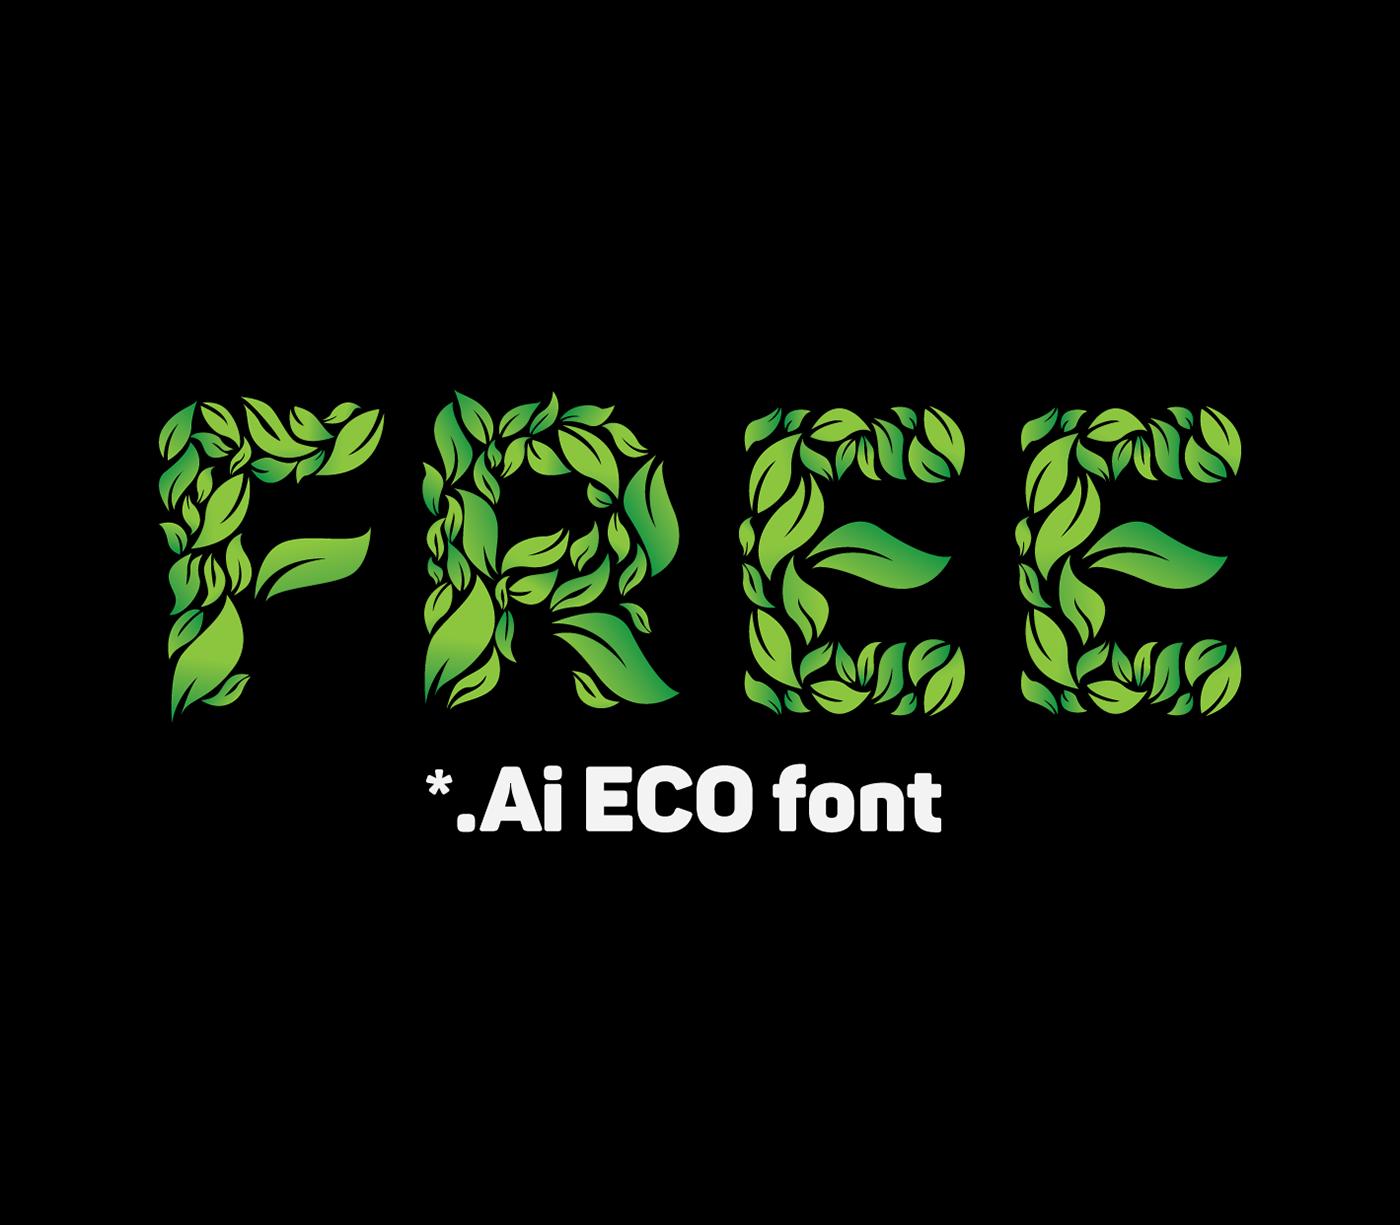 fonte ecofont gratis